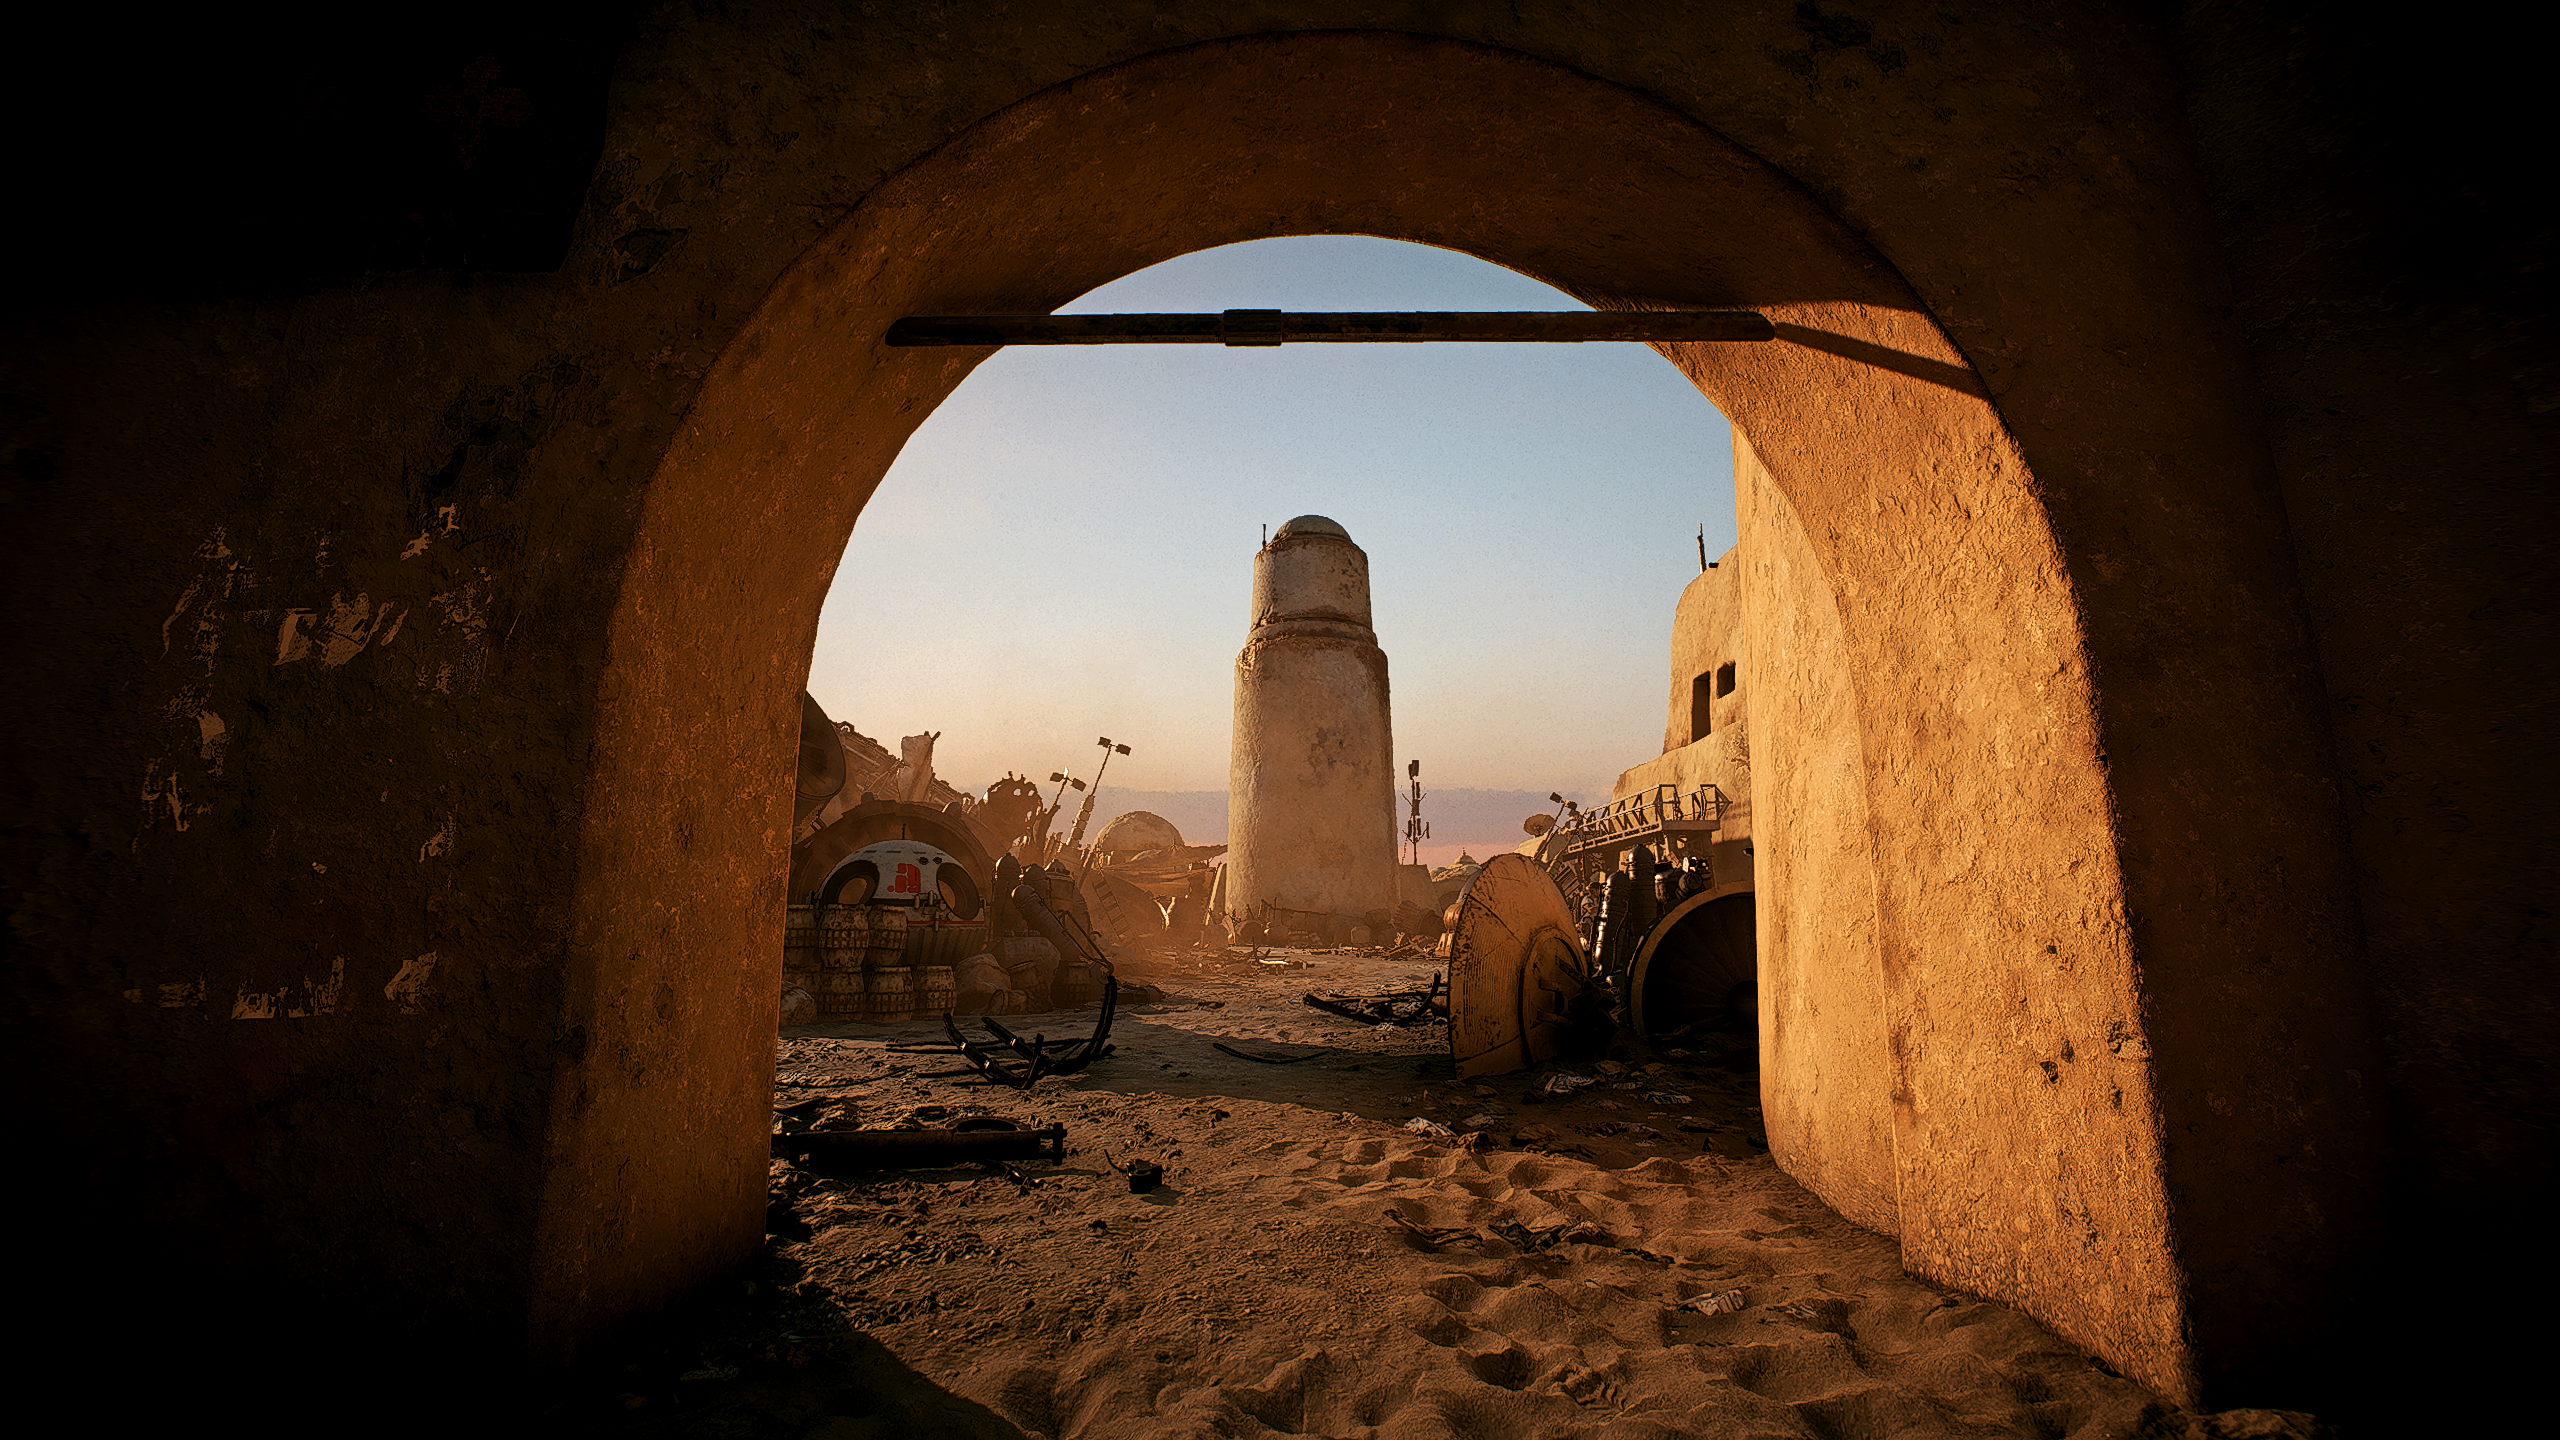 Star Wars Battlefront Ii Hd Wallpaper Background Image